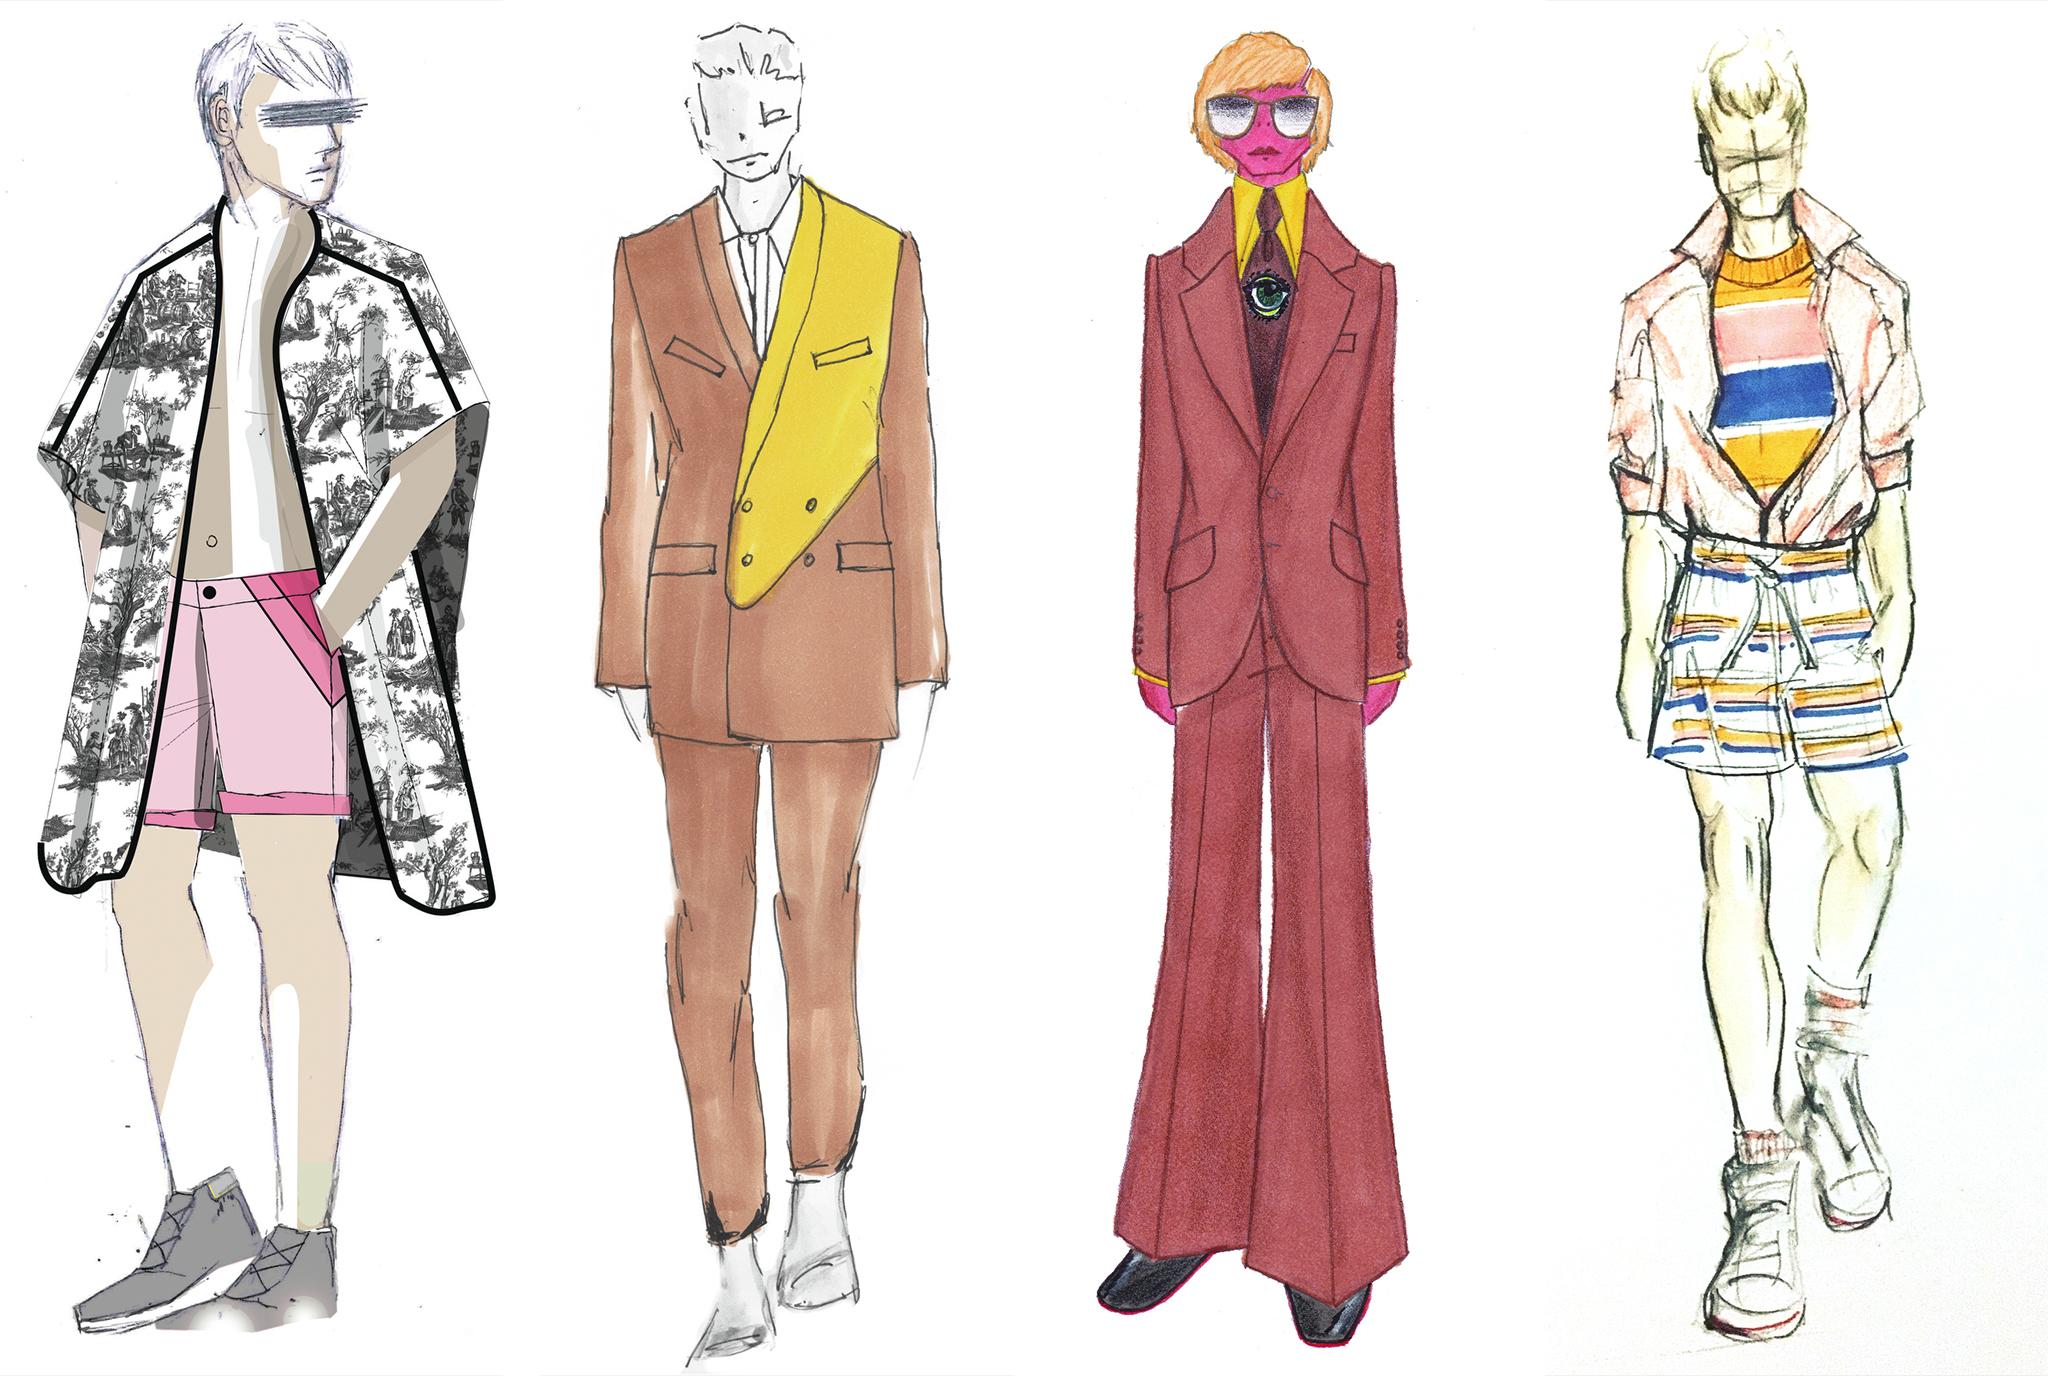 Sketches from Descendant of Thieves, Carlos Campos, David Hart and Parke & Ronan.